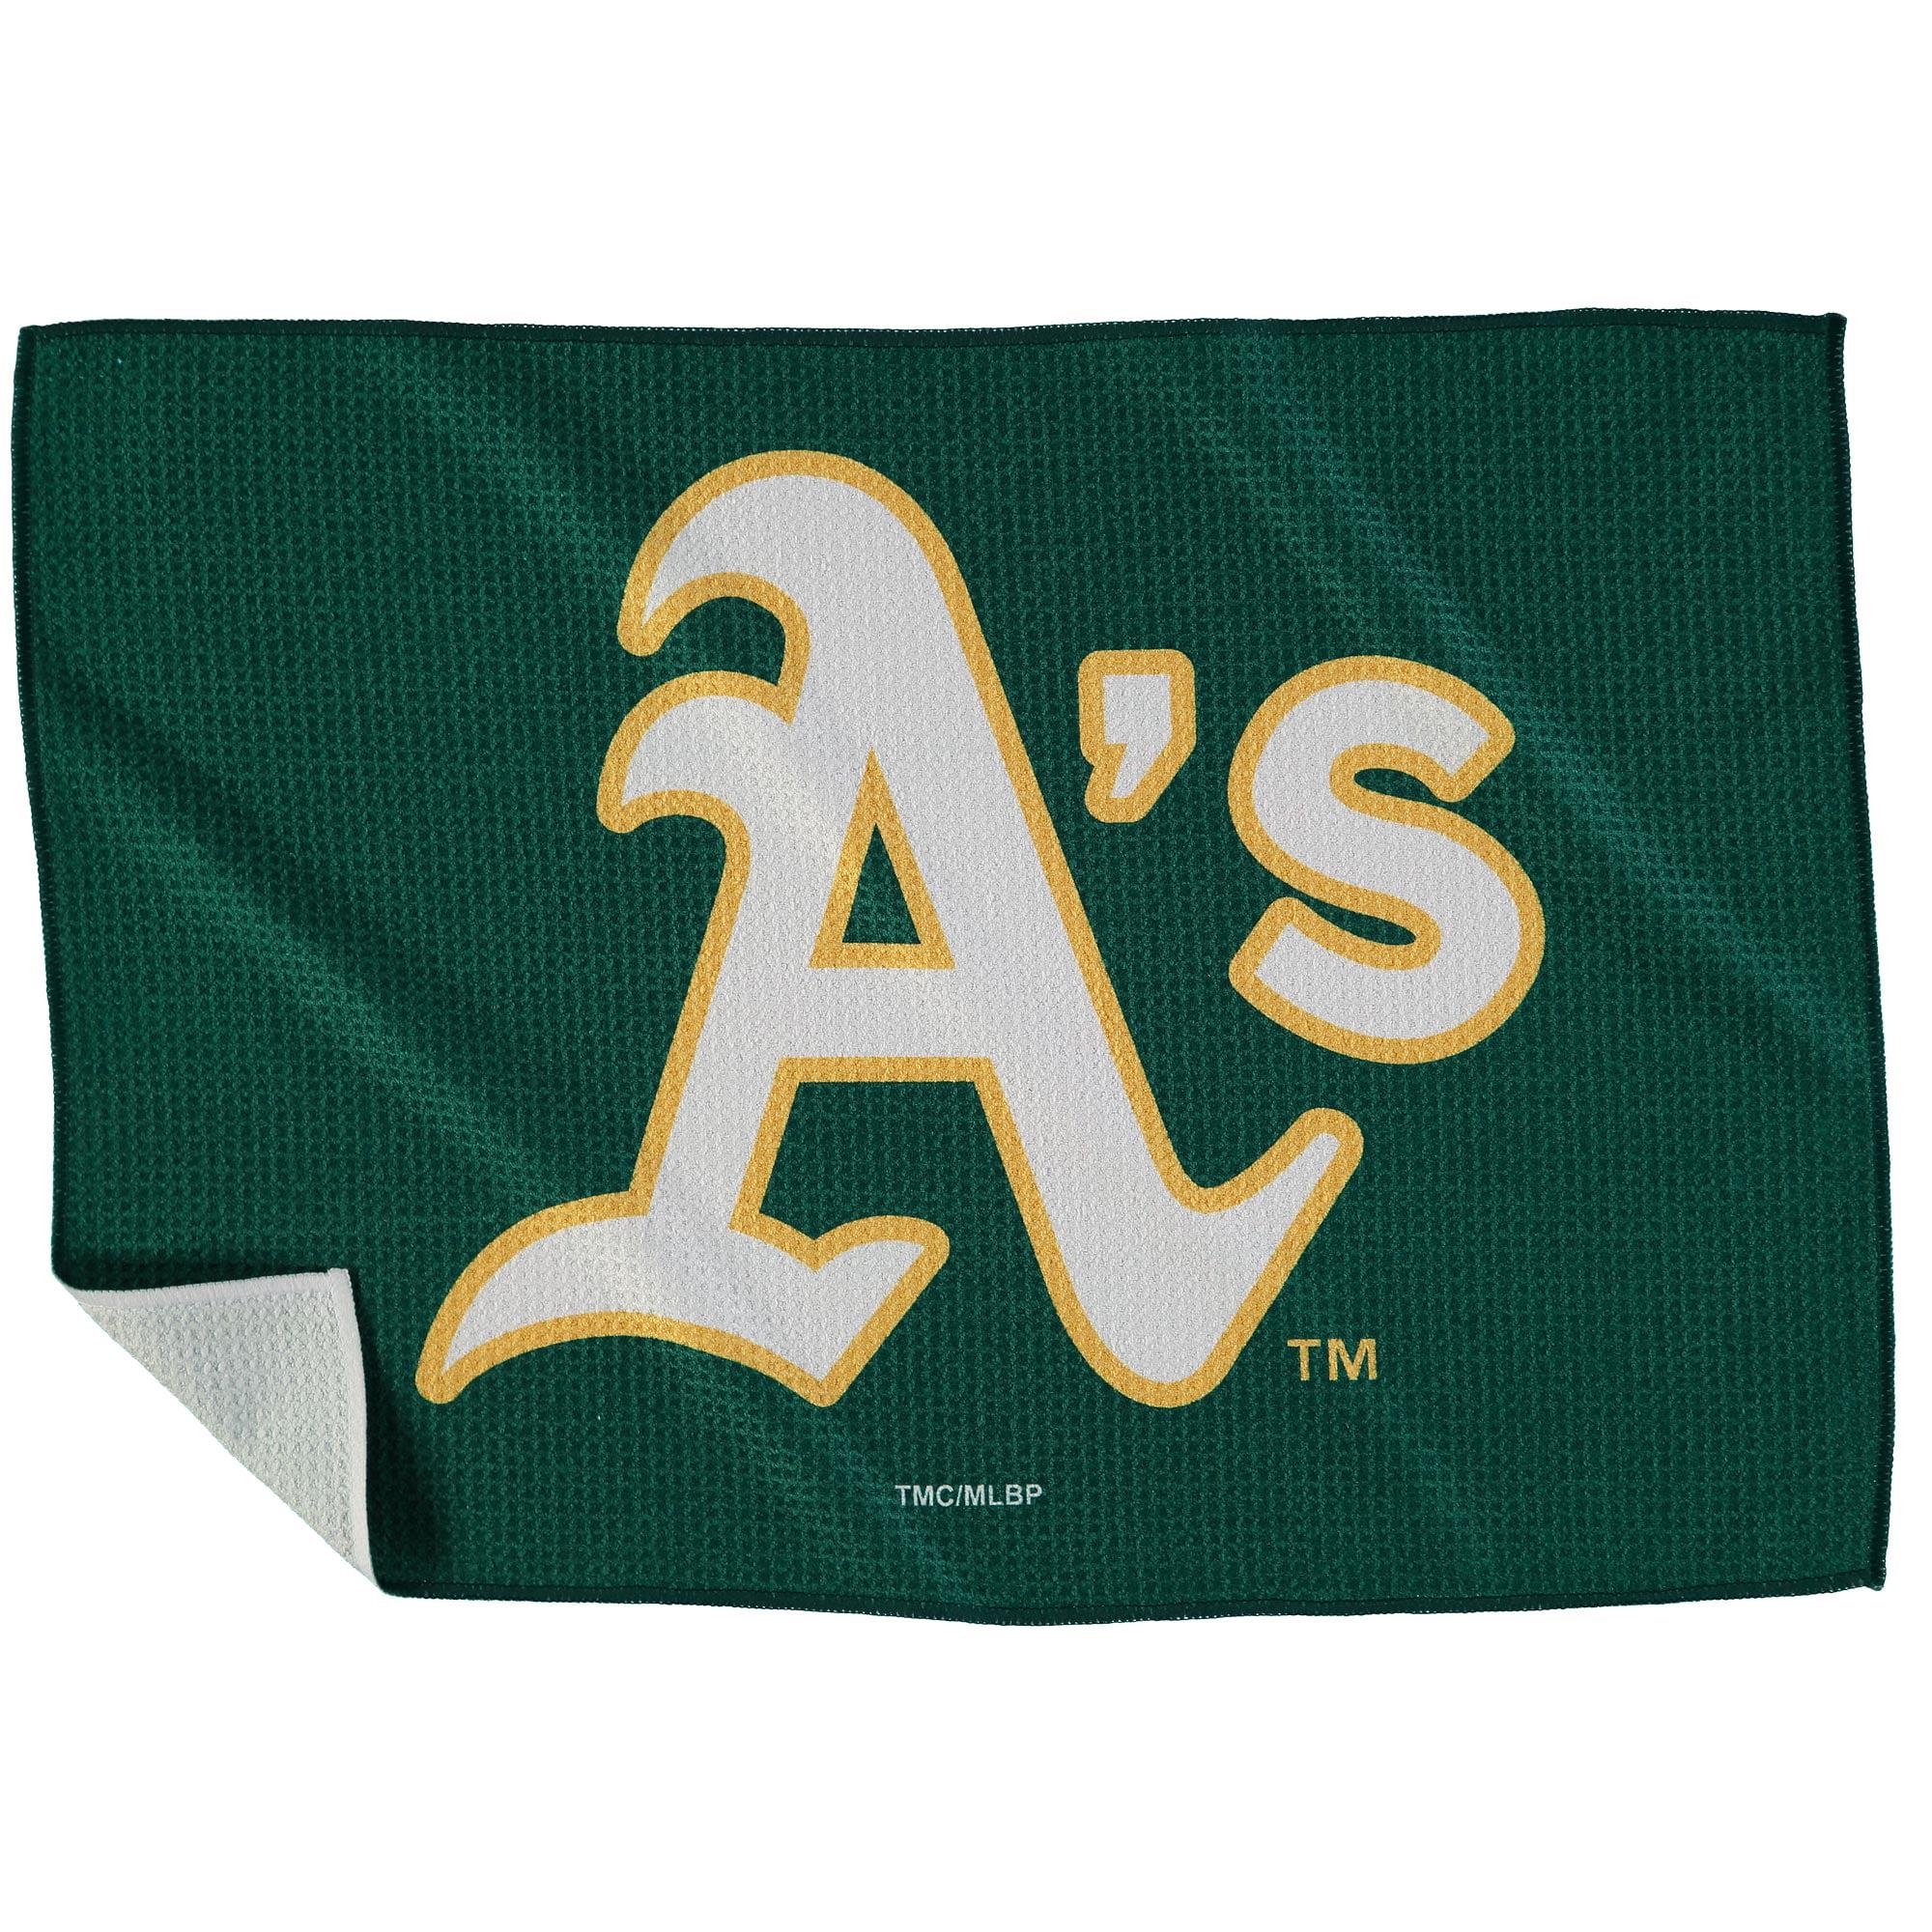 "Oakland Athletics 16"" x 24"" Microfiber Towel - No Size"